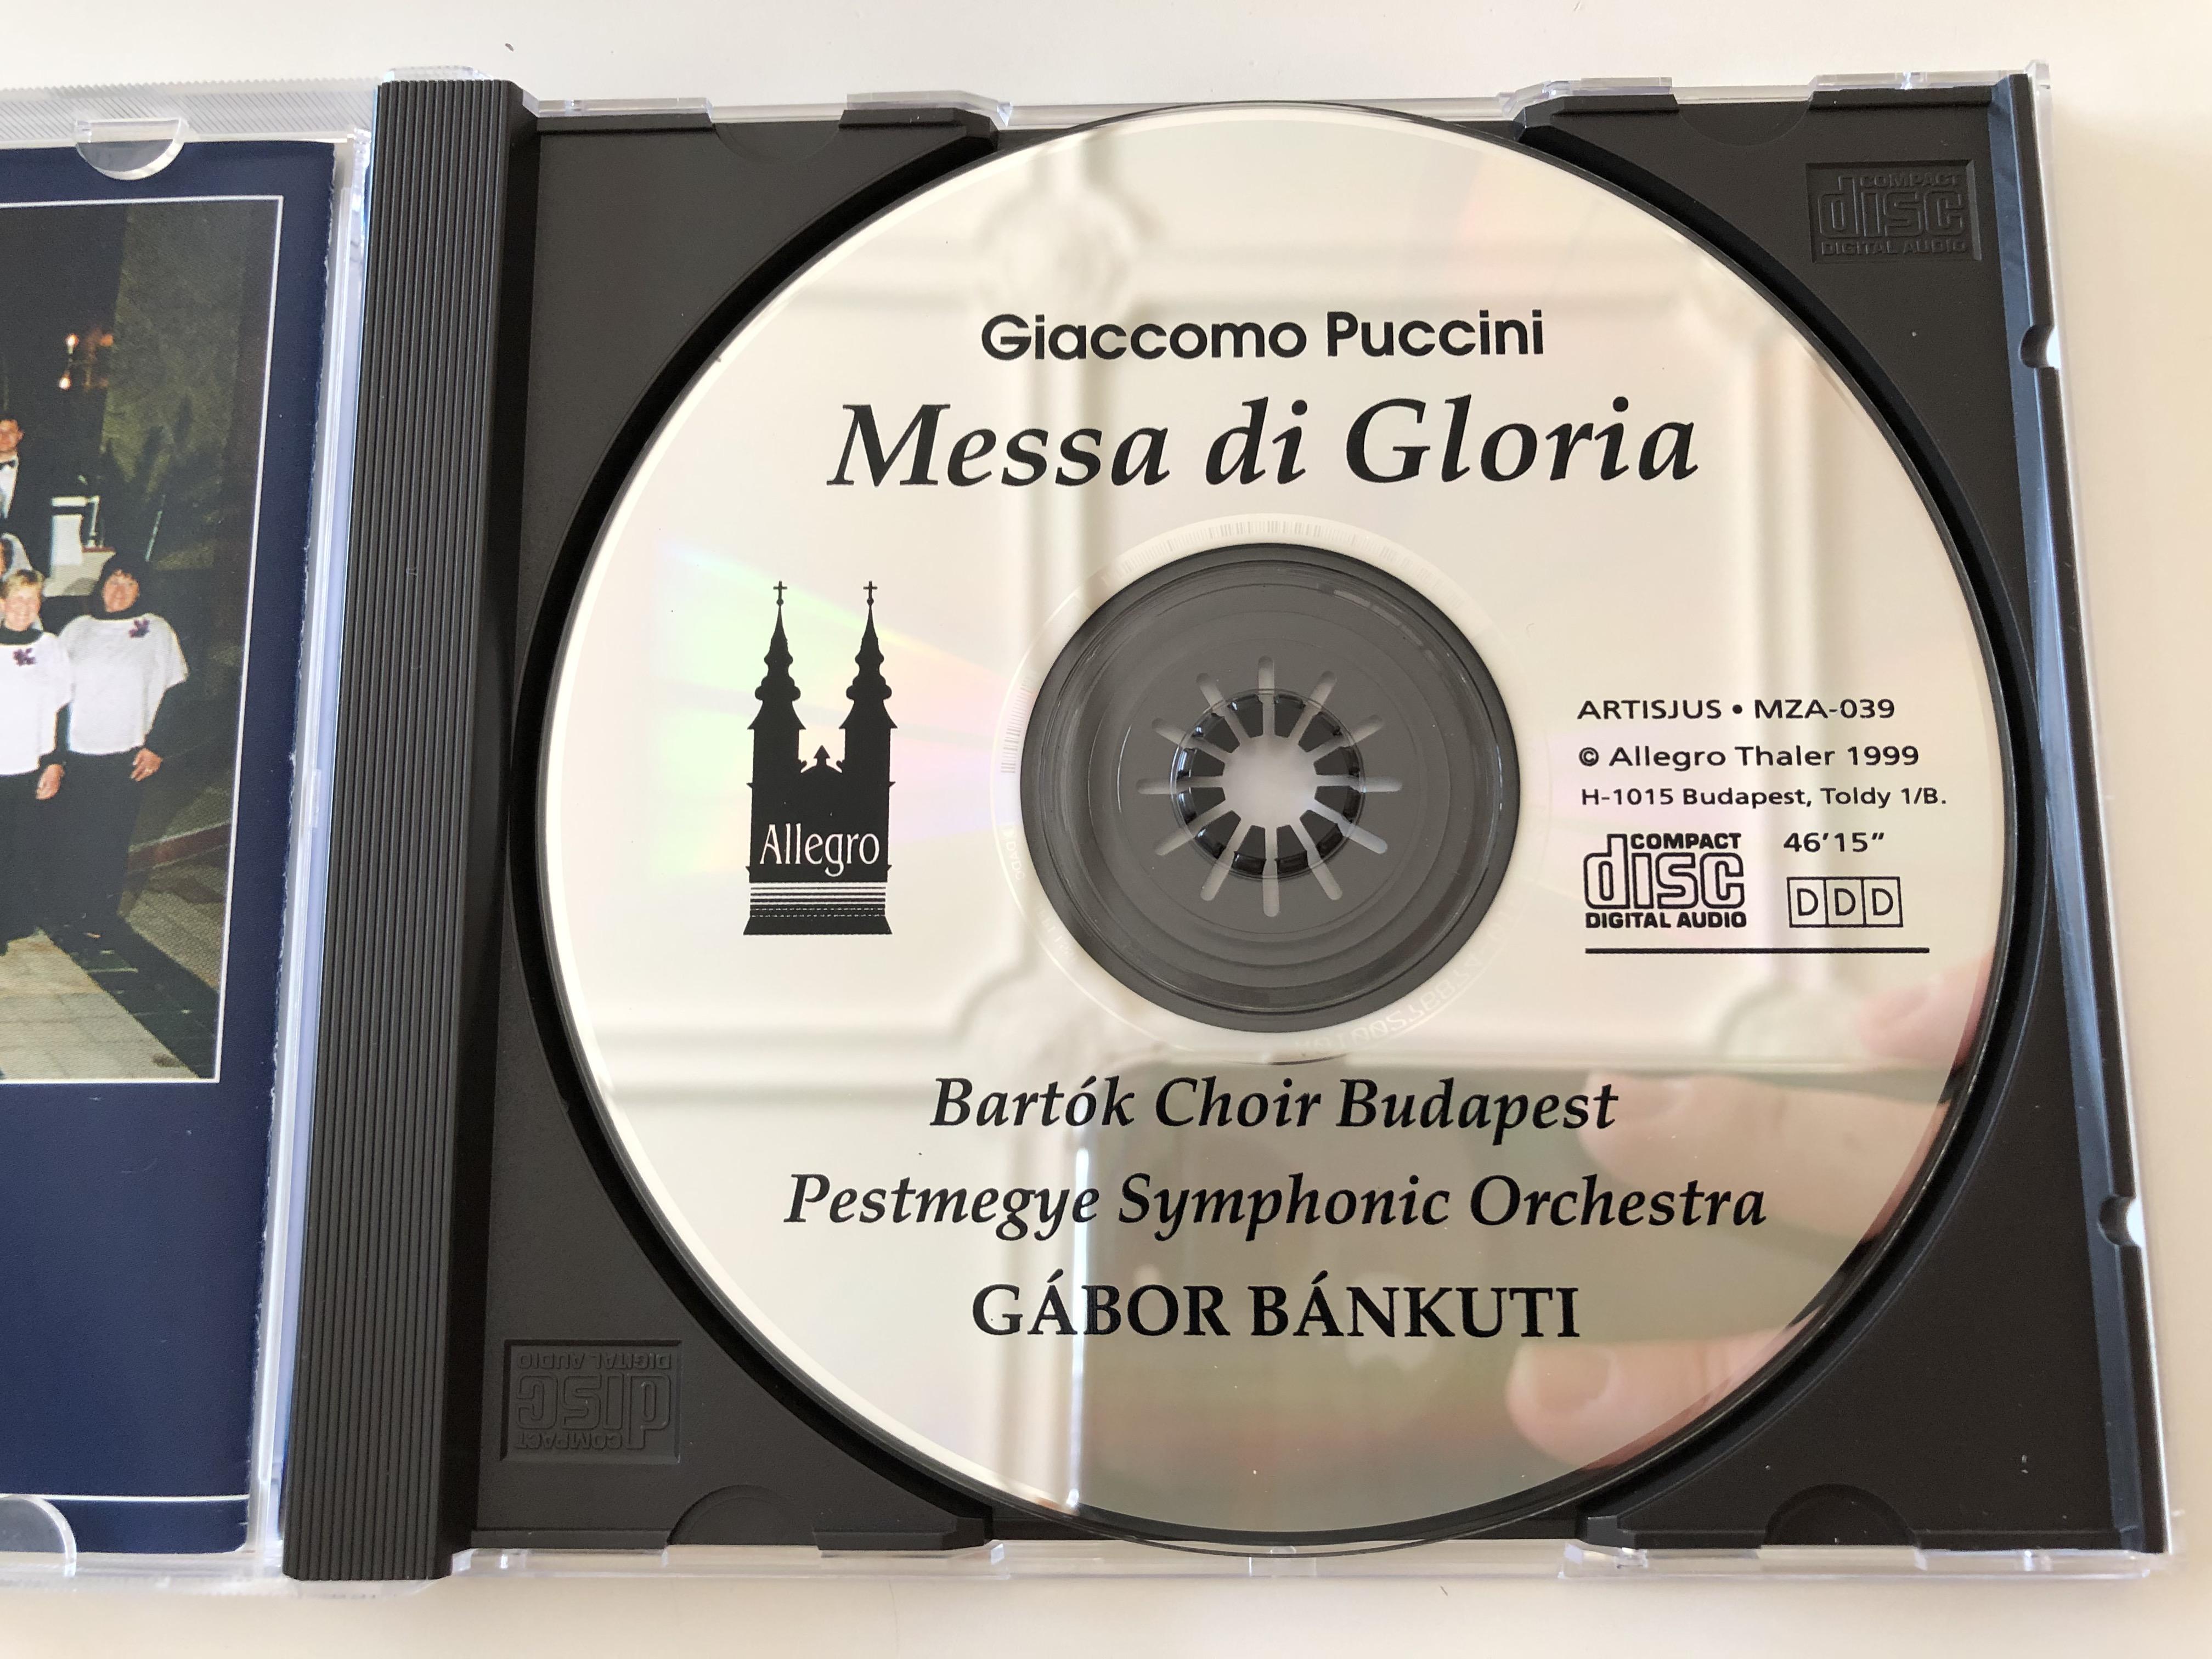 puccini-messa-di-gloria-andr-s-moln-r-gy-rgy-bord-s-jozsef-gregor-bart-k-choir-budapest-pestmegye-symphonic-orchestra-g-bor-b-nkuti-allegro-thaler-audio-cd-1999-mza-039-6-.jpg